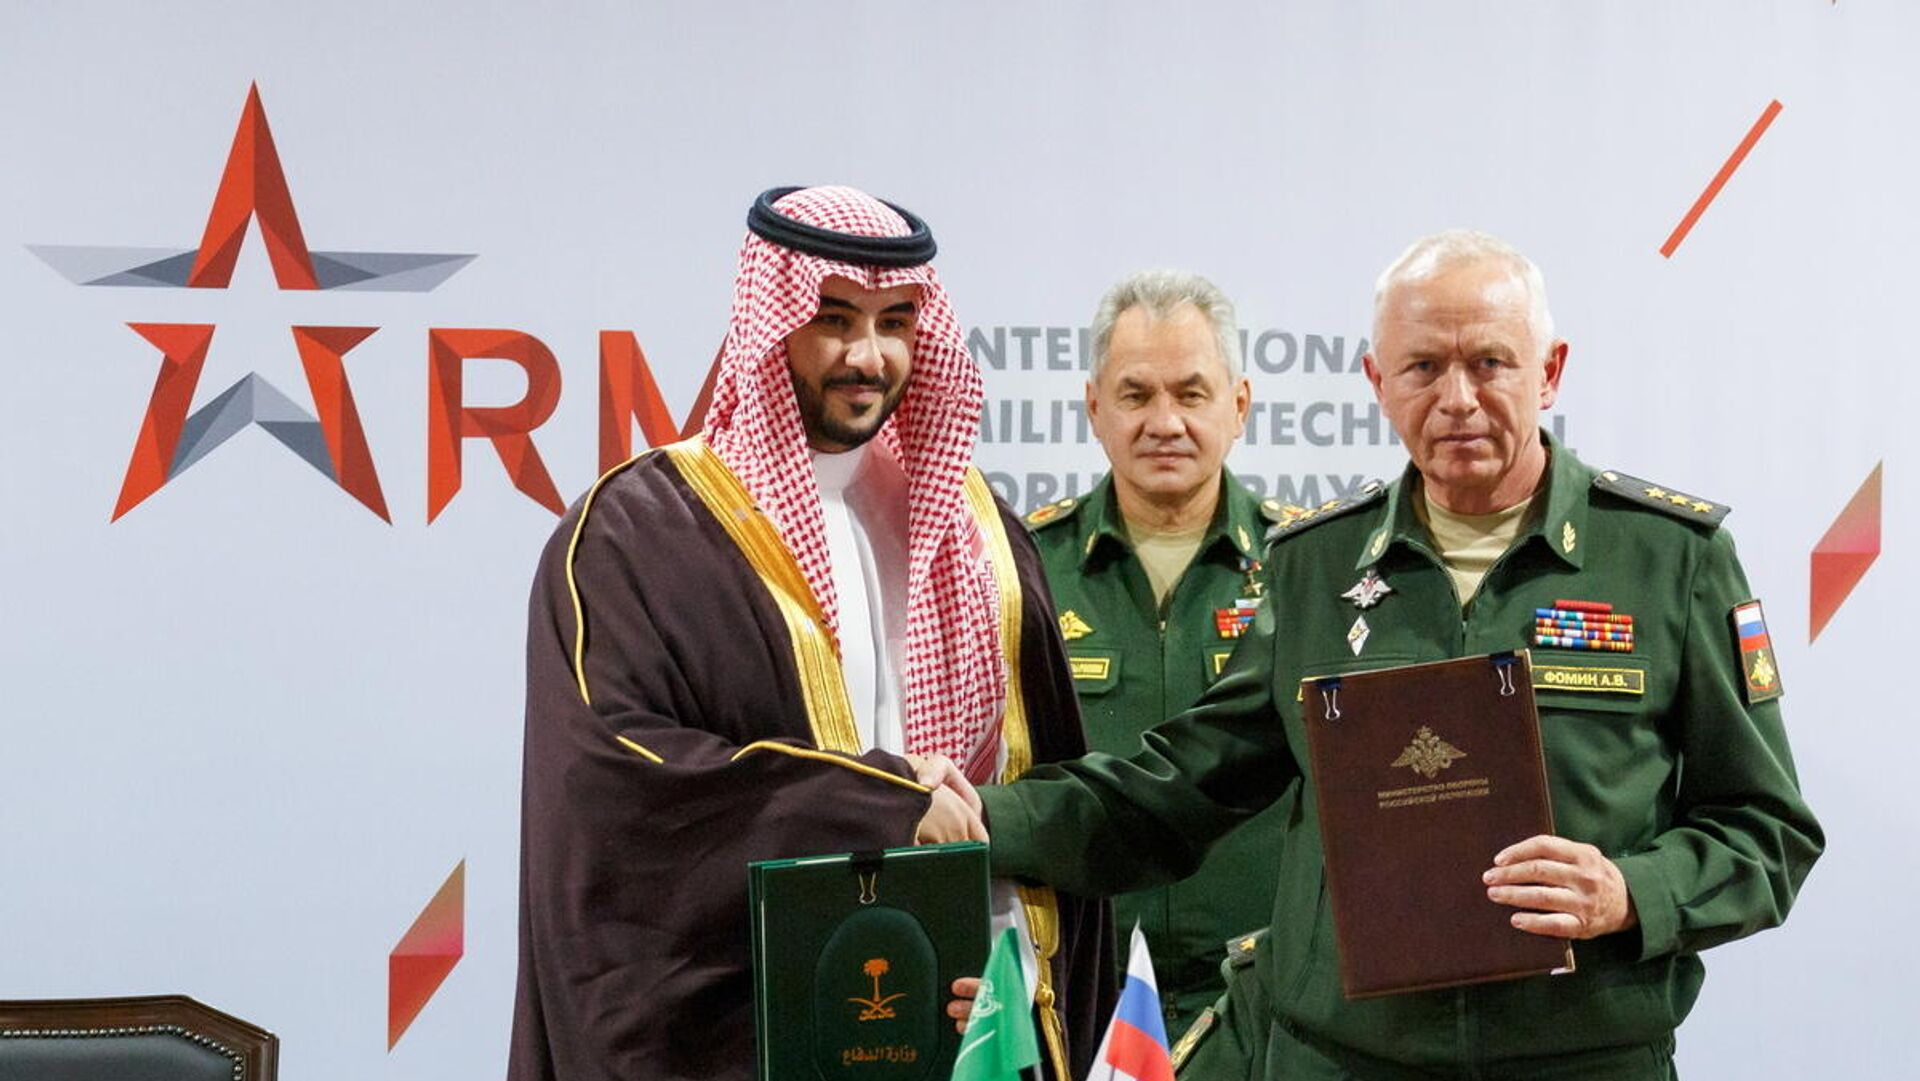 Khalid bin Salman Al Saud, viceministro de Defensa de Arabia Saudita, Serguéi Shoigú,  ministro de defensa de Rusia y Alexandr Fomin, viceministro de Defensa ruso  - Sputnik Mundo, 1920, 24.08.2021